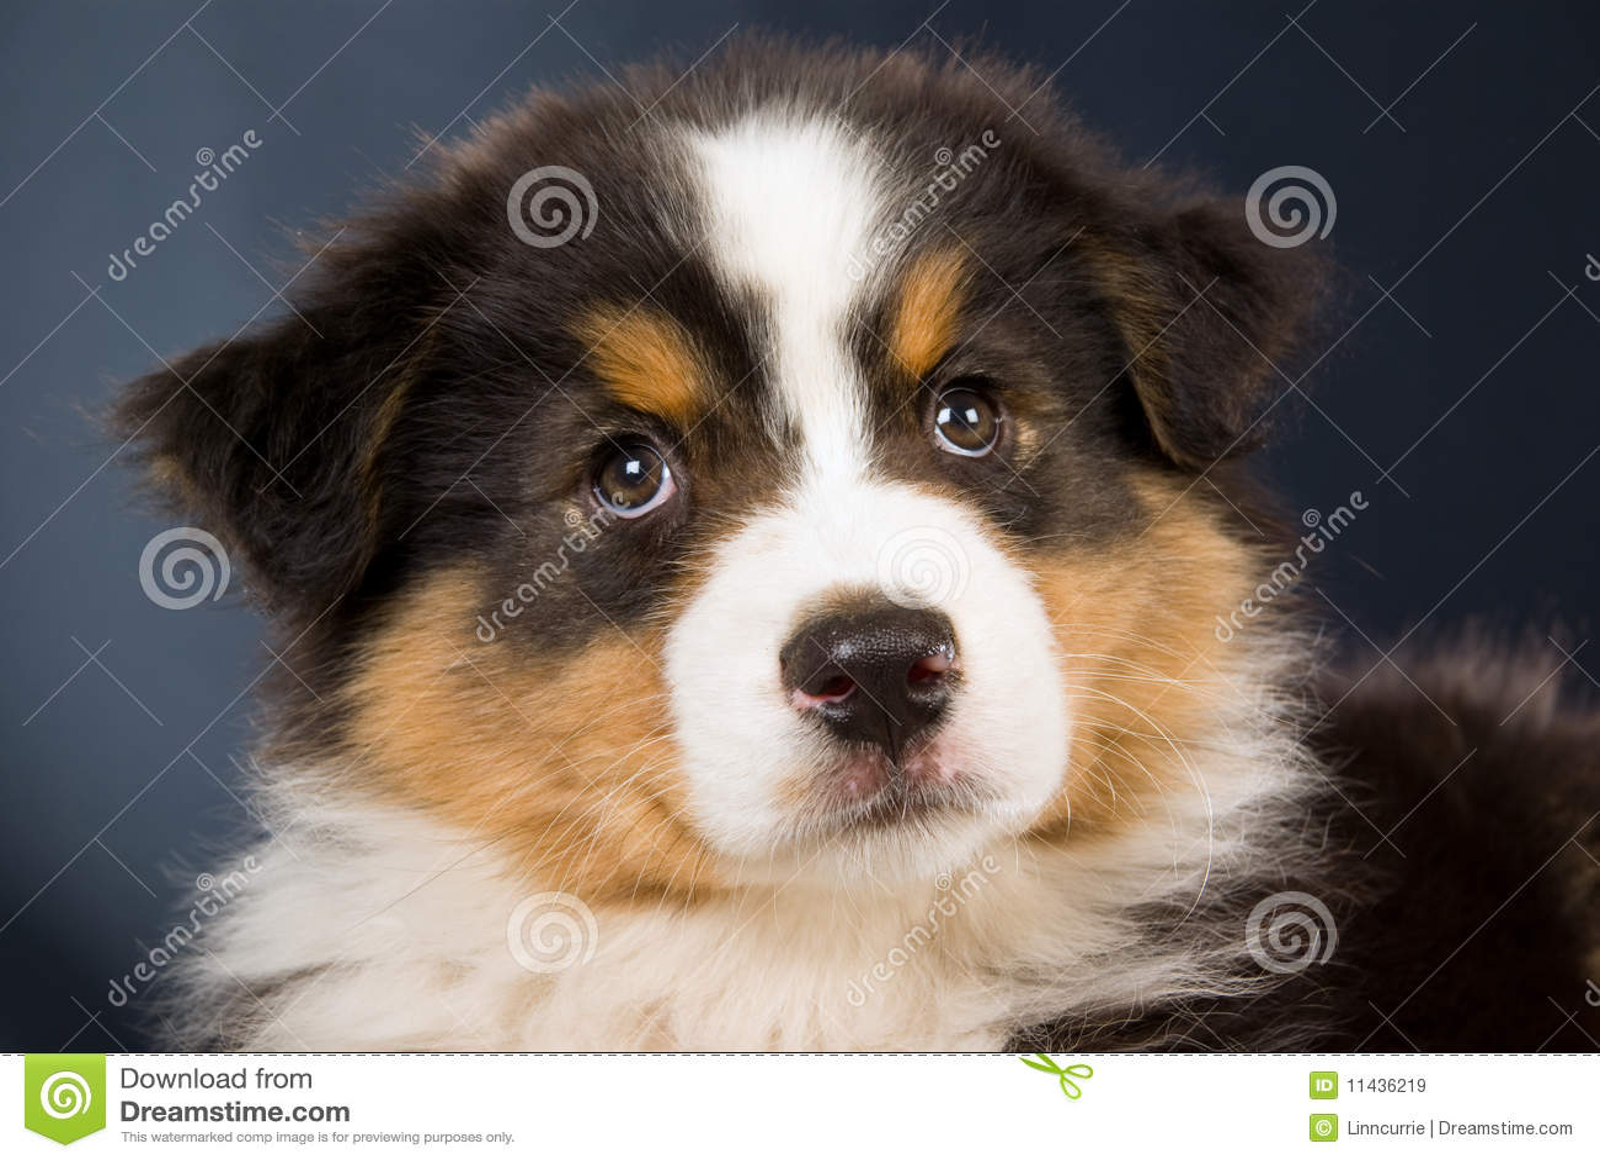 Portrait Of Australian Shepherd Puppy Royalty Free Stock Images ...